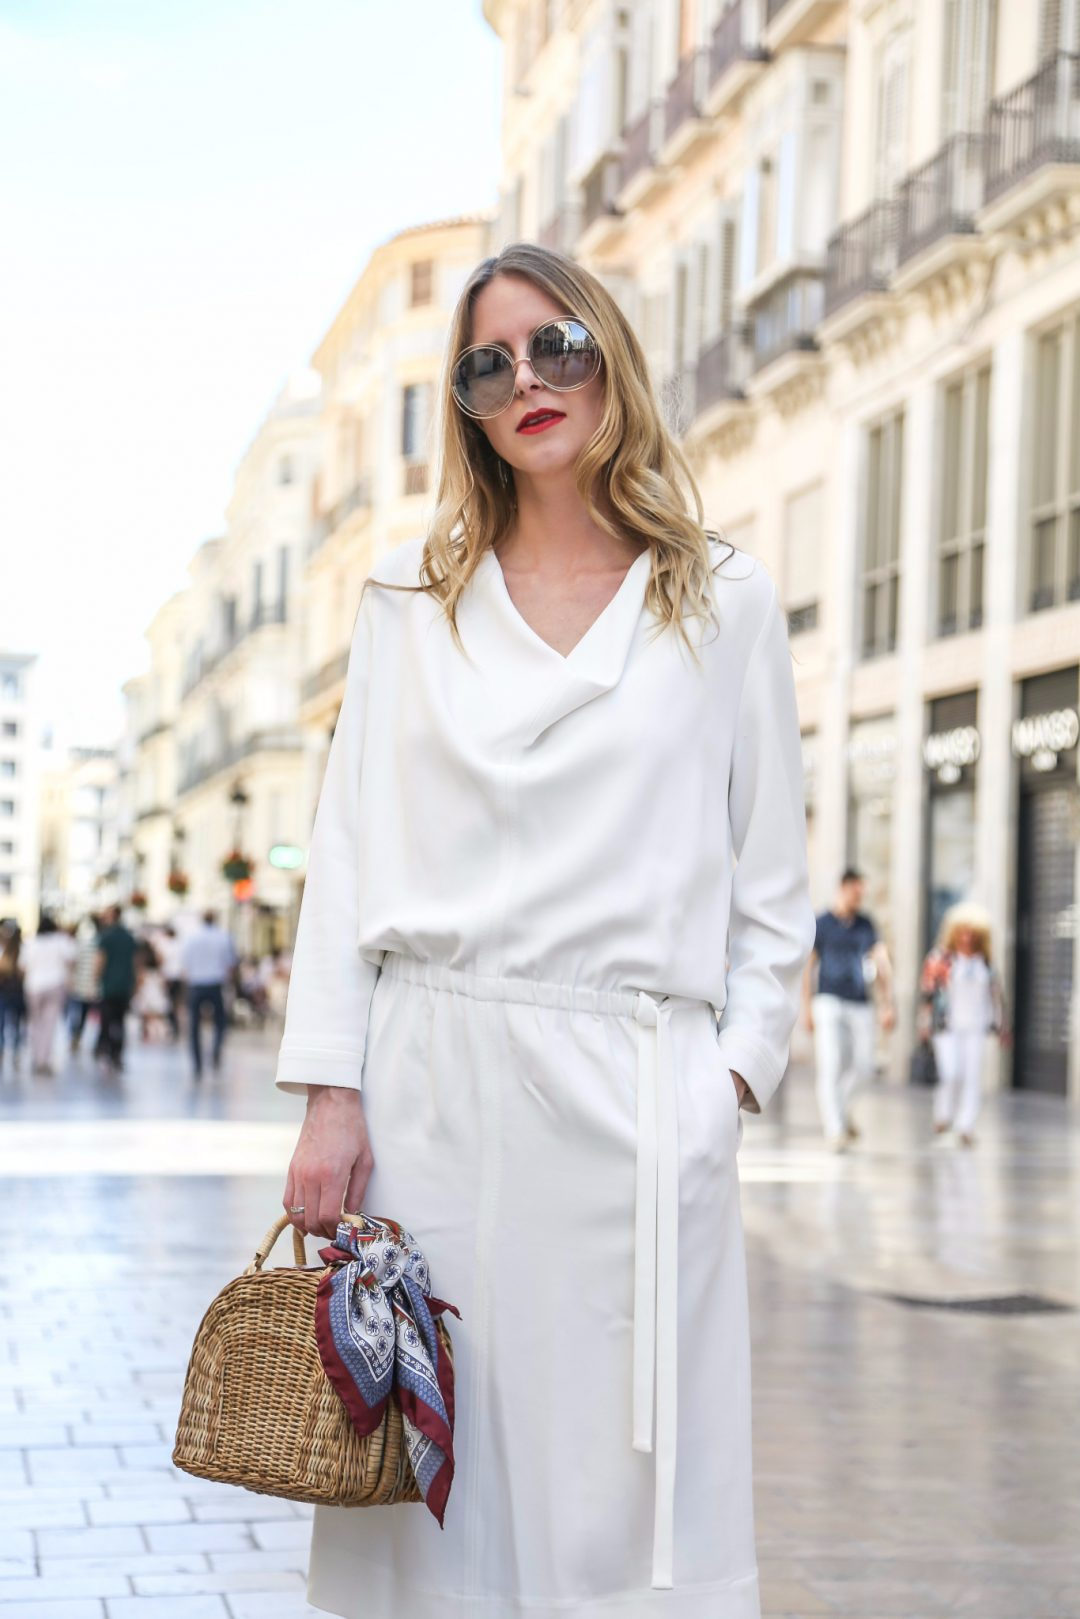 MOD-by-Monique-Fashion-Looks-The-White-Dress-31-1-1080x1619